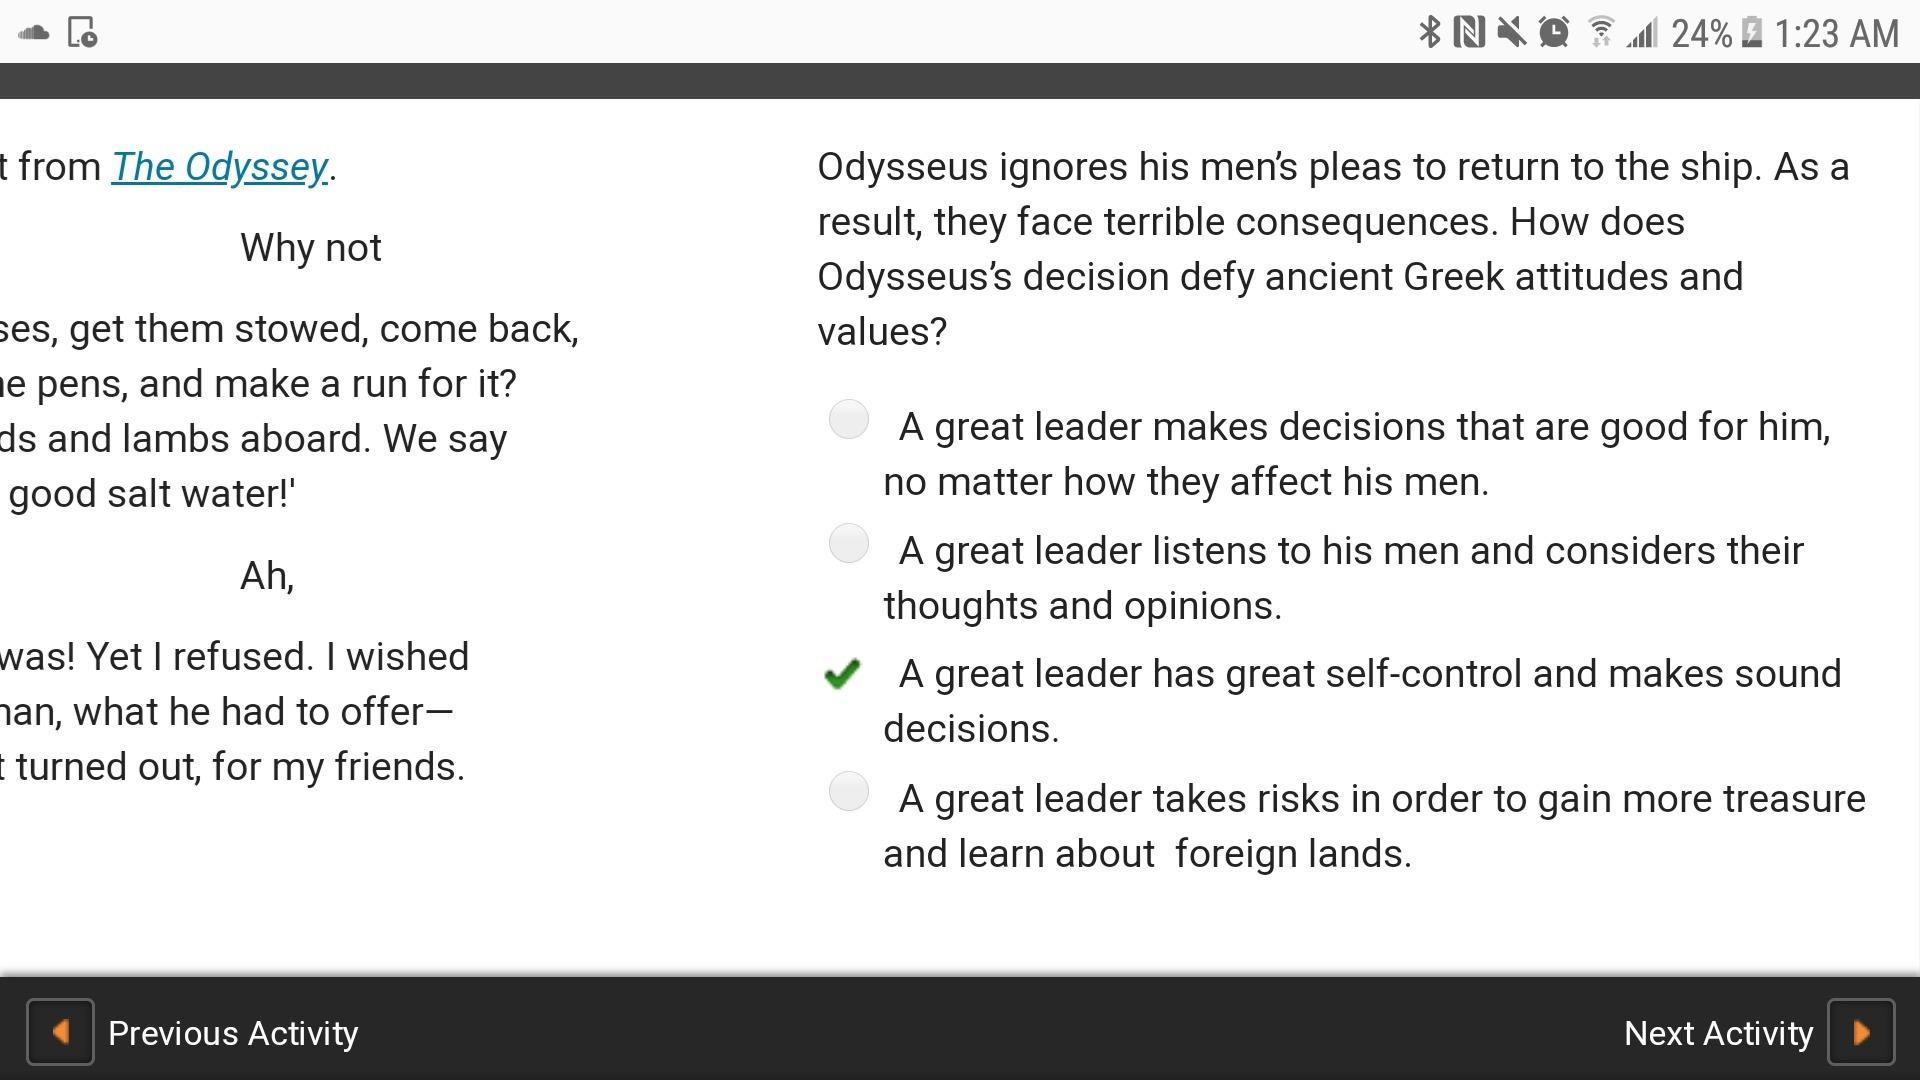 what makes odysseus a good leader